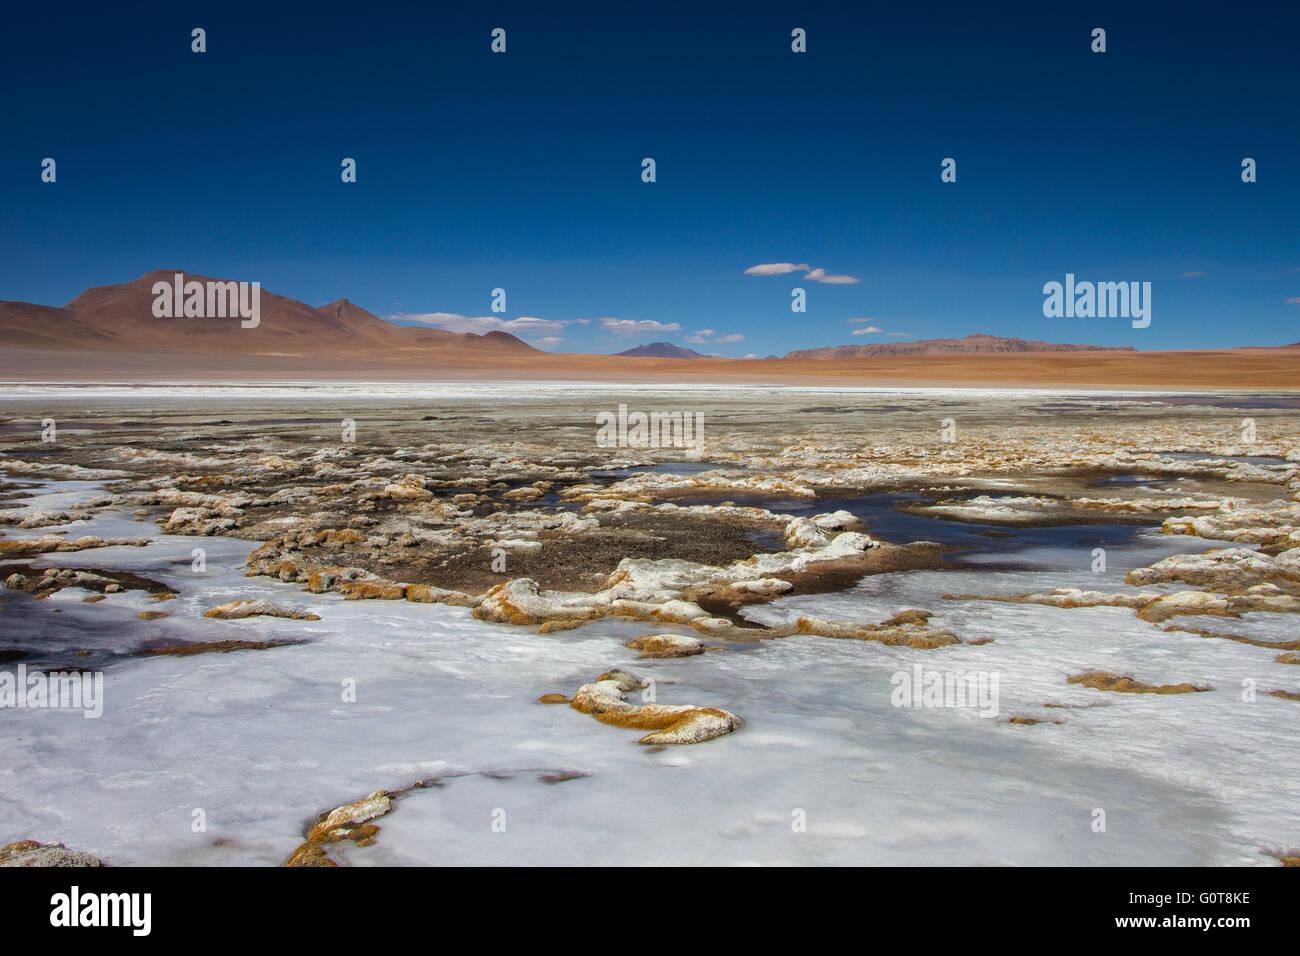 Landscape of desert of Bolivia - Stock Image